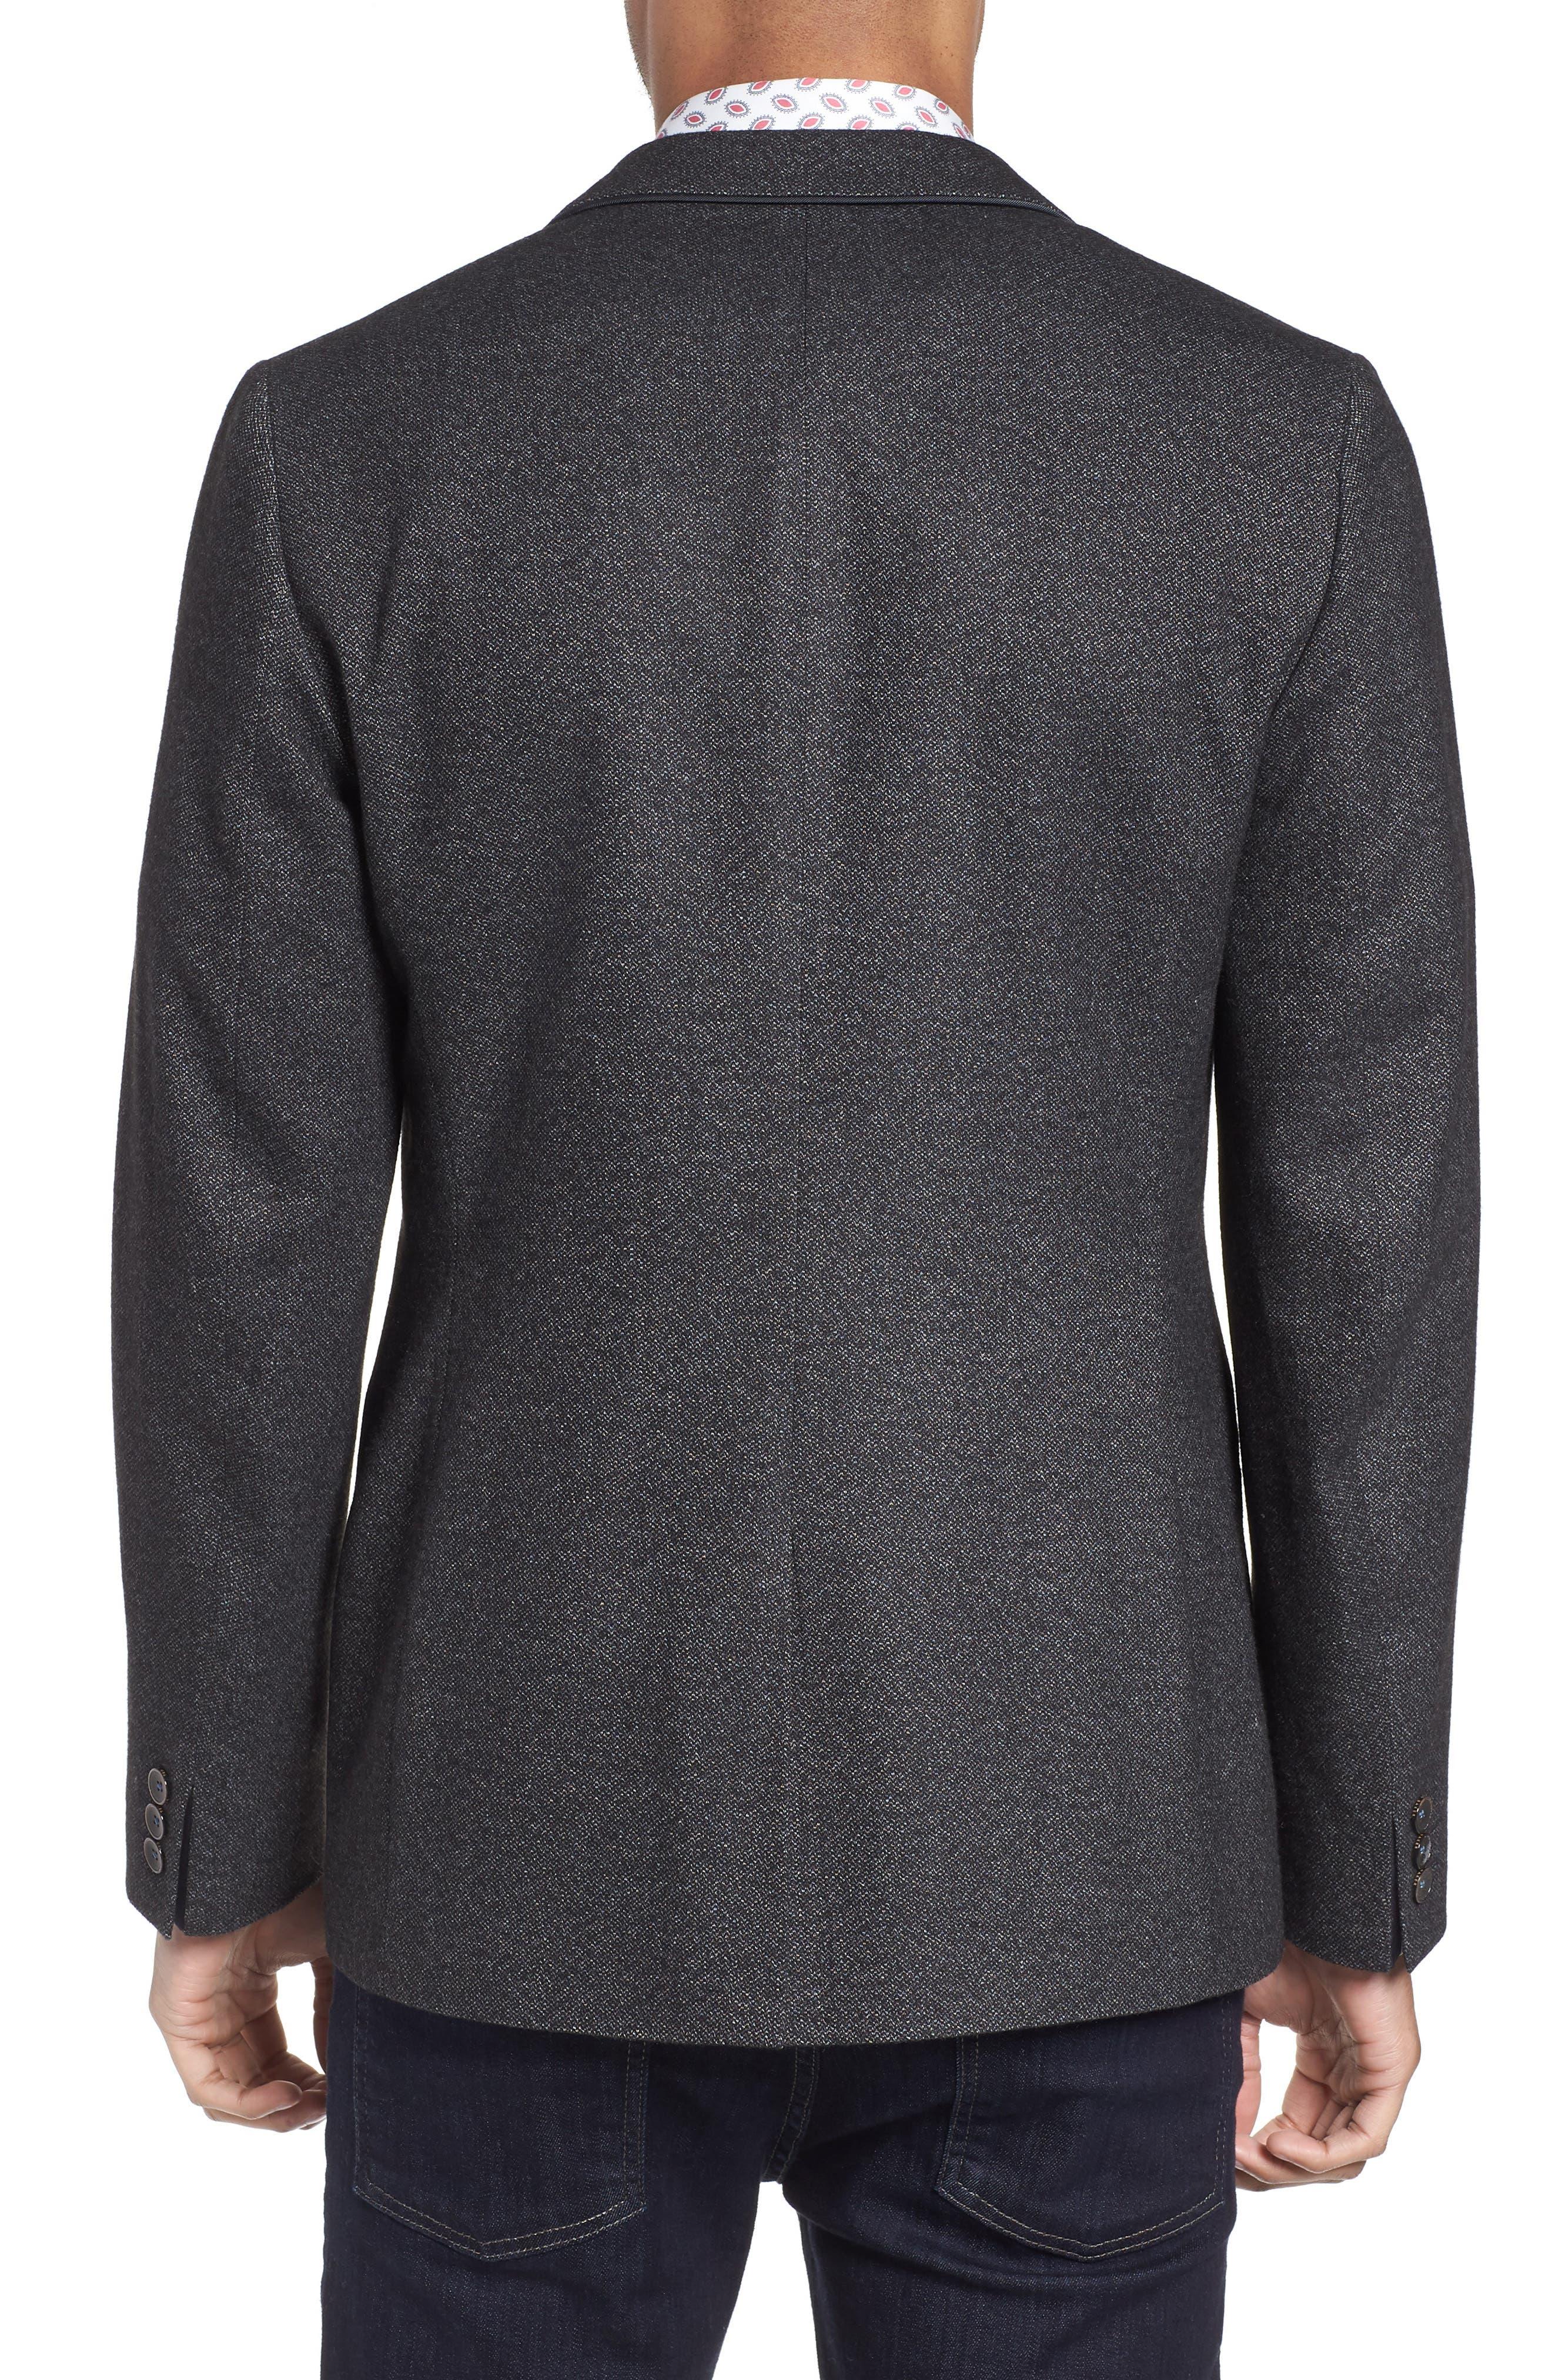 Beektt Semi Plain Trim Fit Jacket,                             Alternate thumbnail 2, color,                             Charcoal